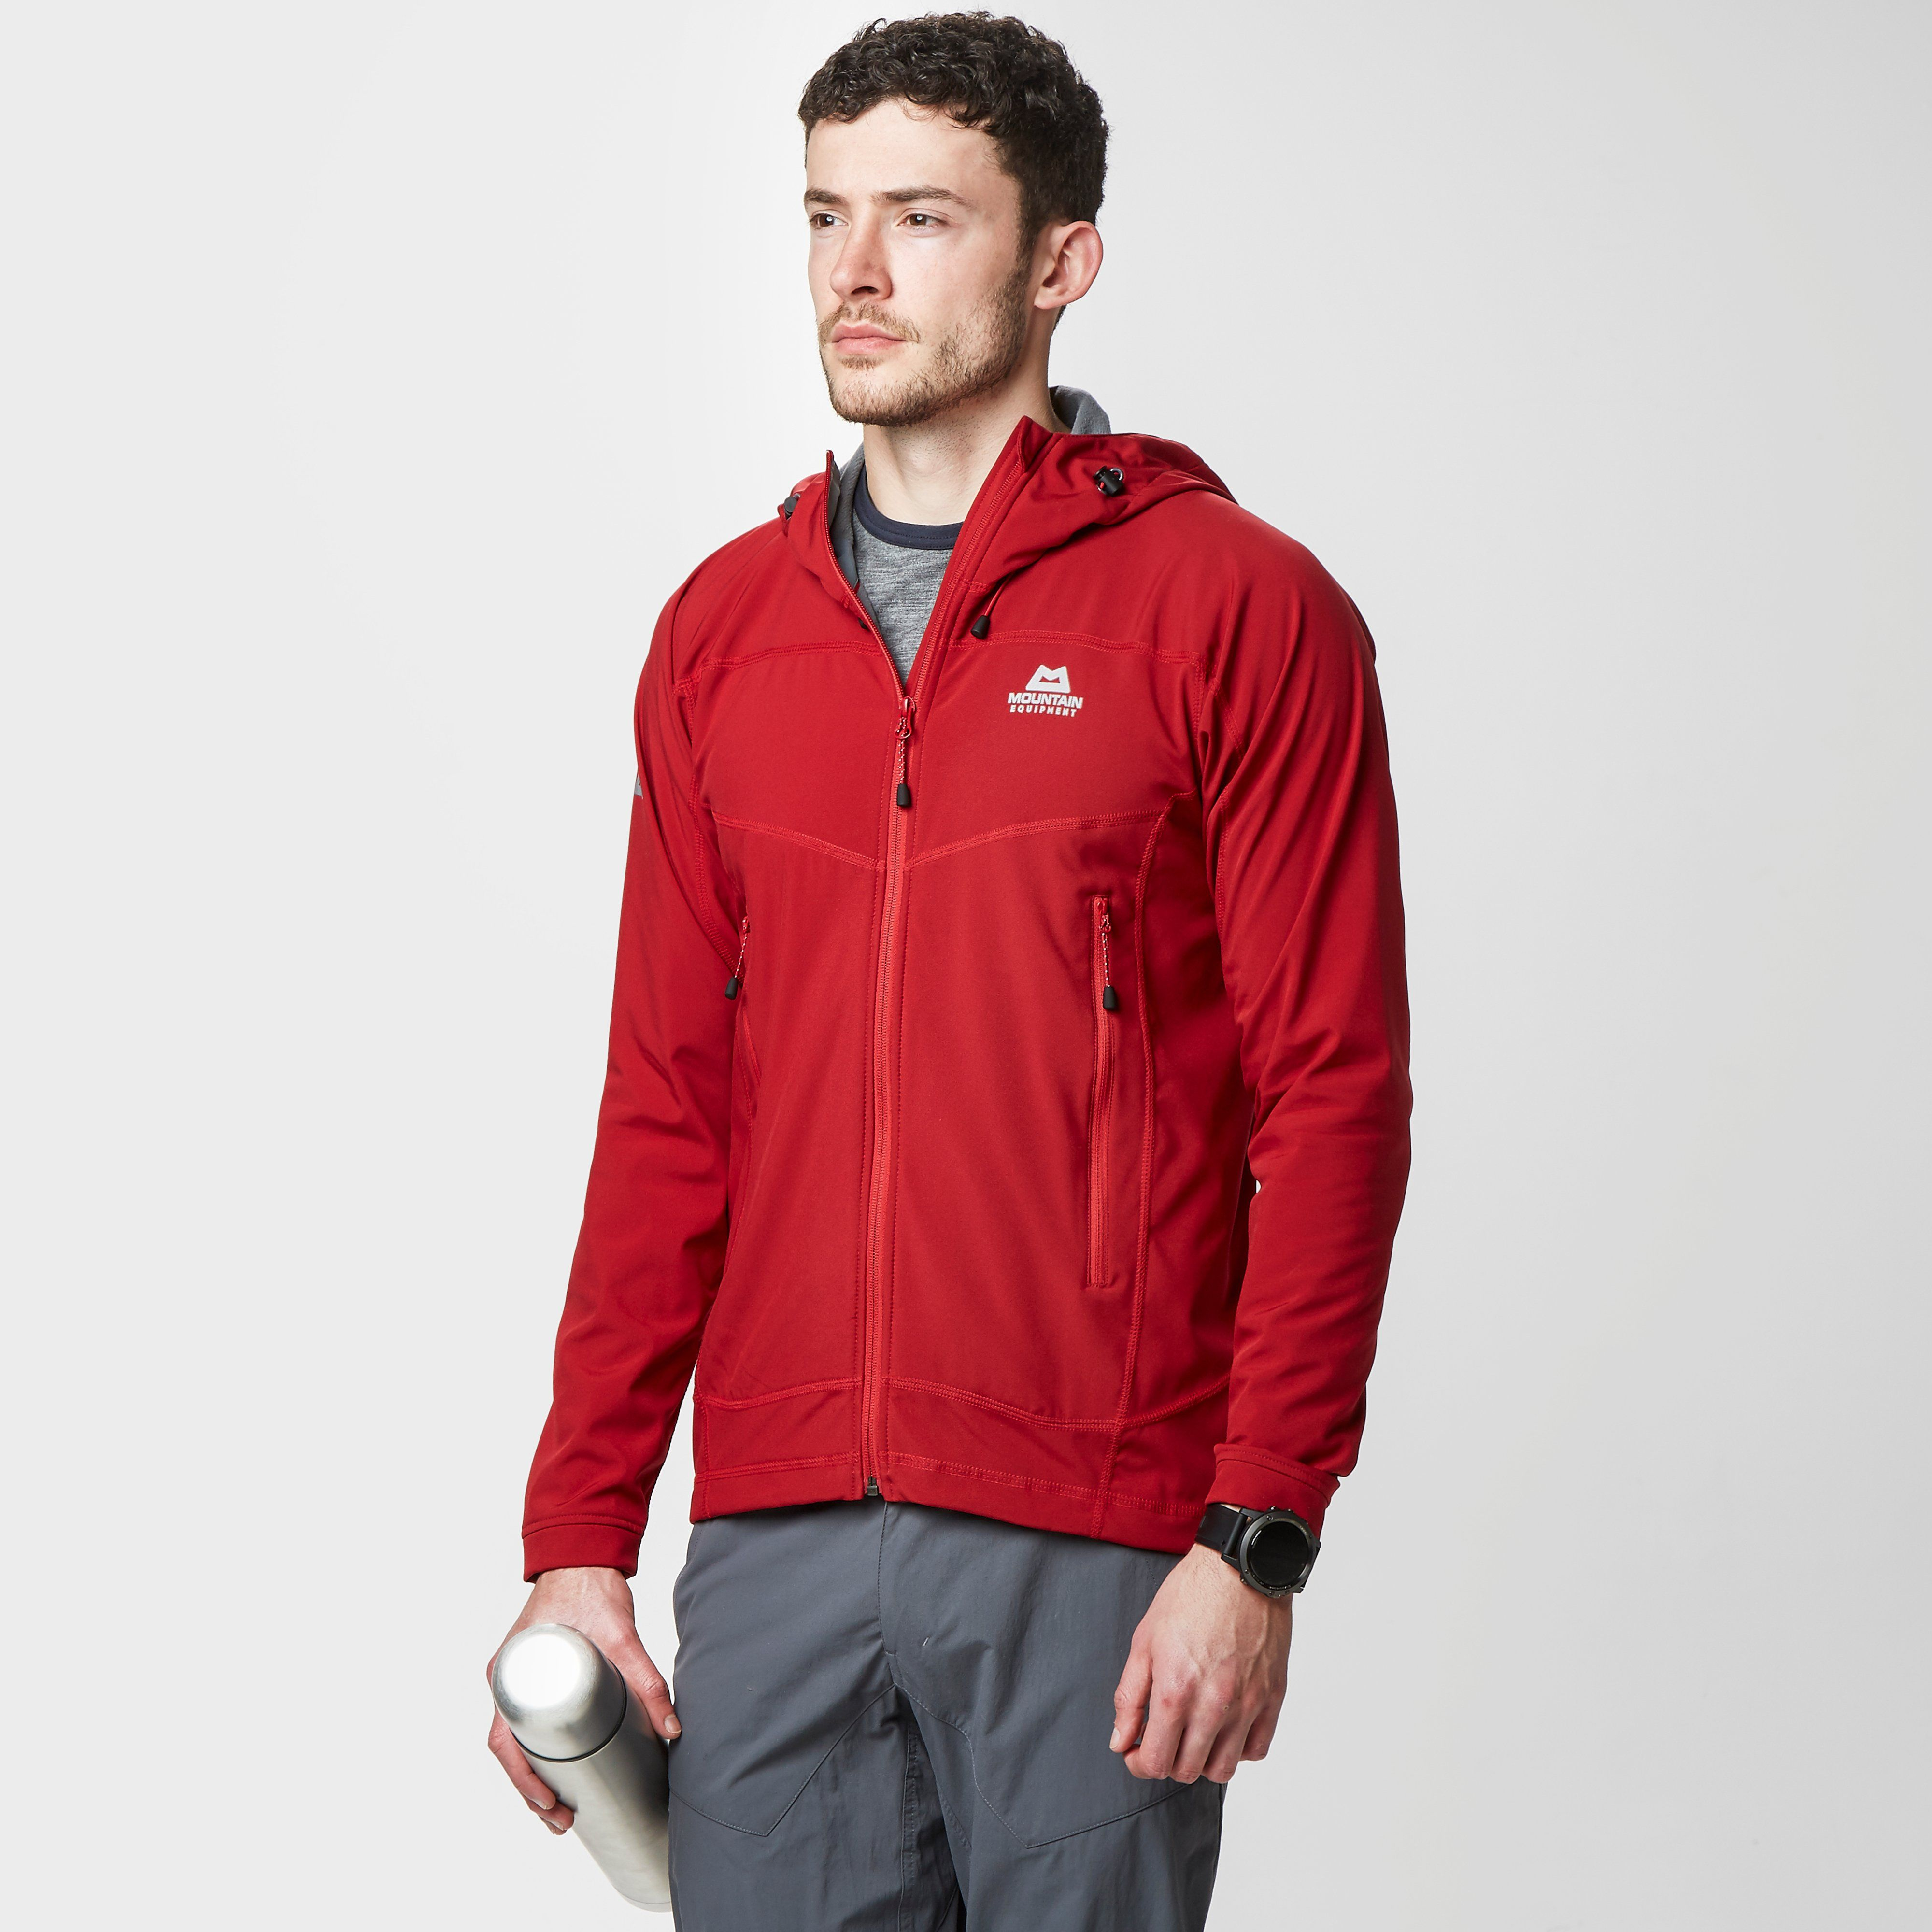 MOUNTAIN EQUIPMENT Men's Astron Hooded Jacket